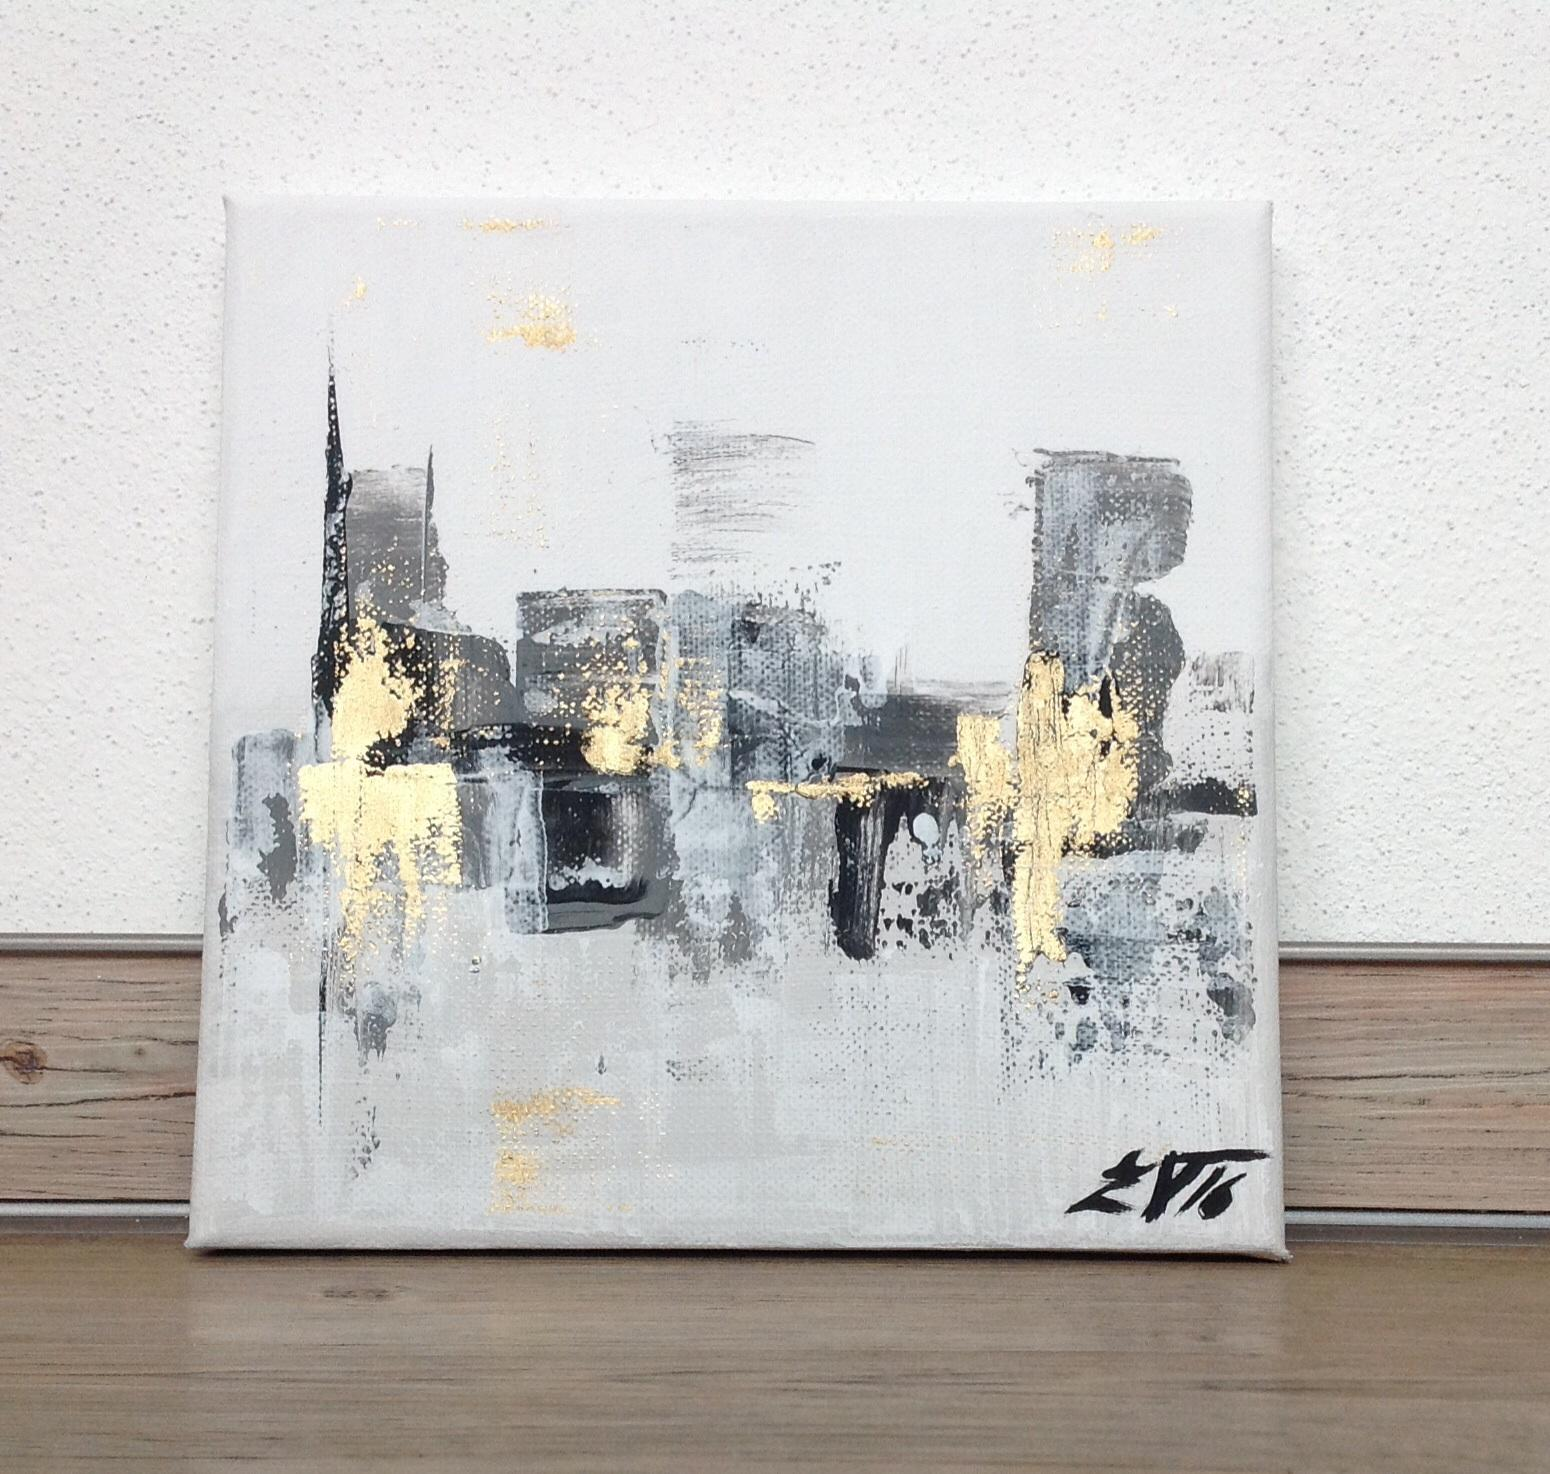 Obrazy na zakázku - Zlatý stín, akryl+olej, 20x20 cm